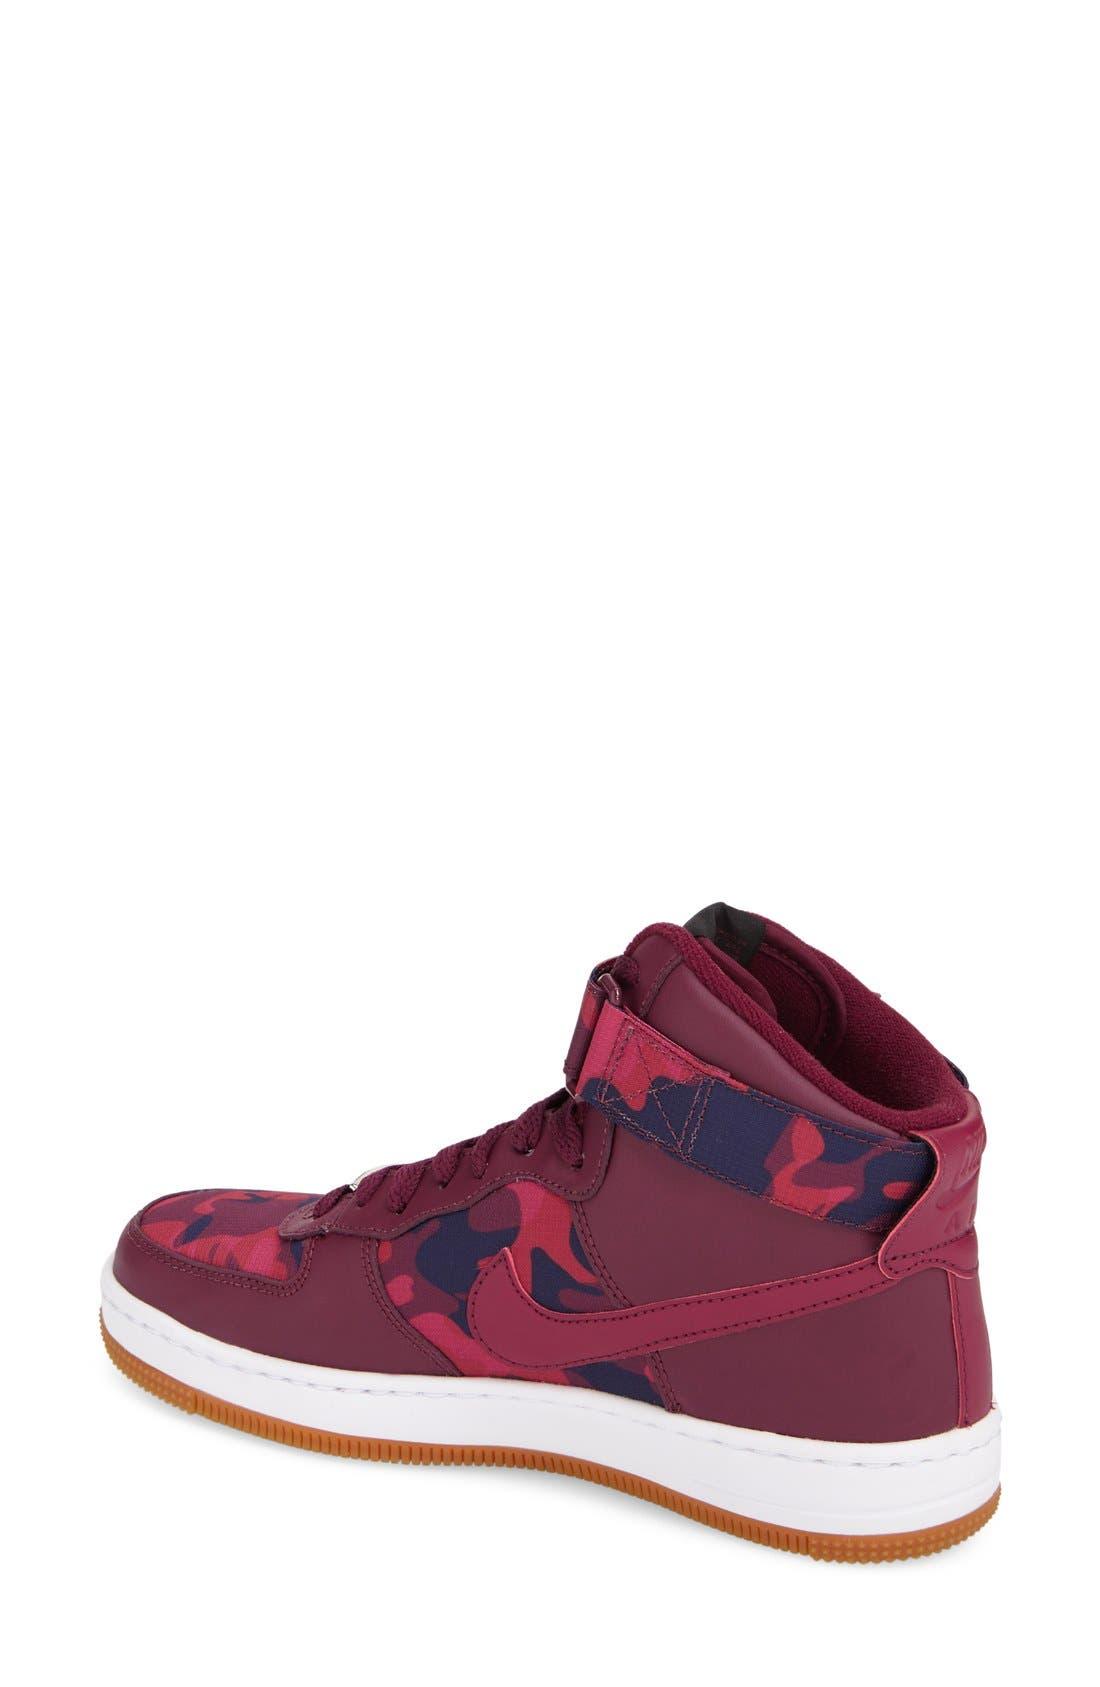 Alternate Image 2  - Nike 'AF-1 Ultra Force' Sneaker (Women)